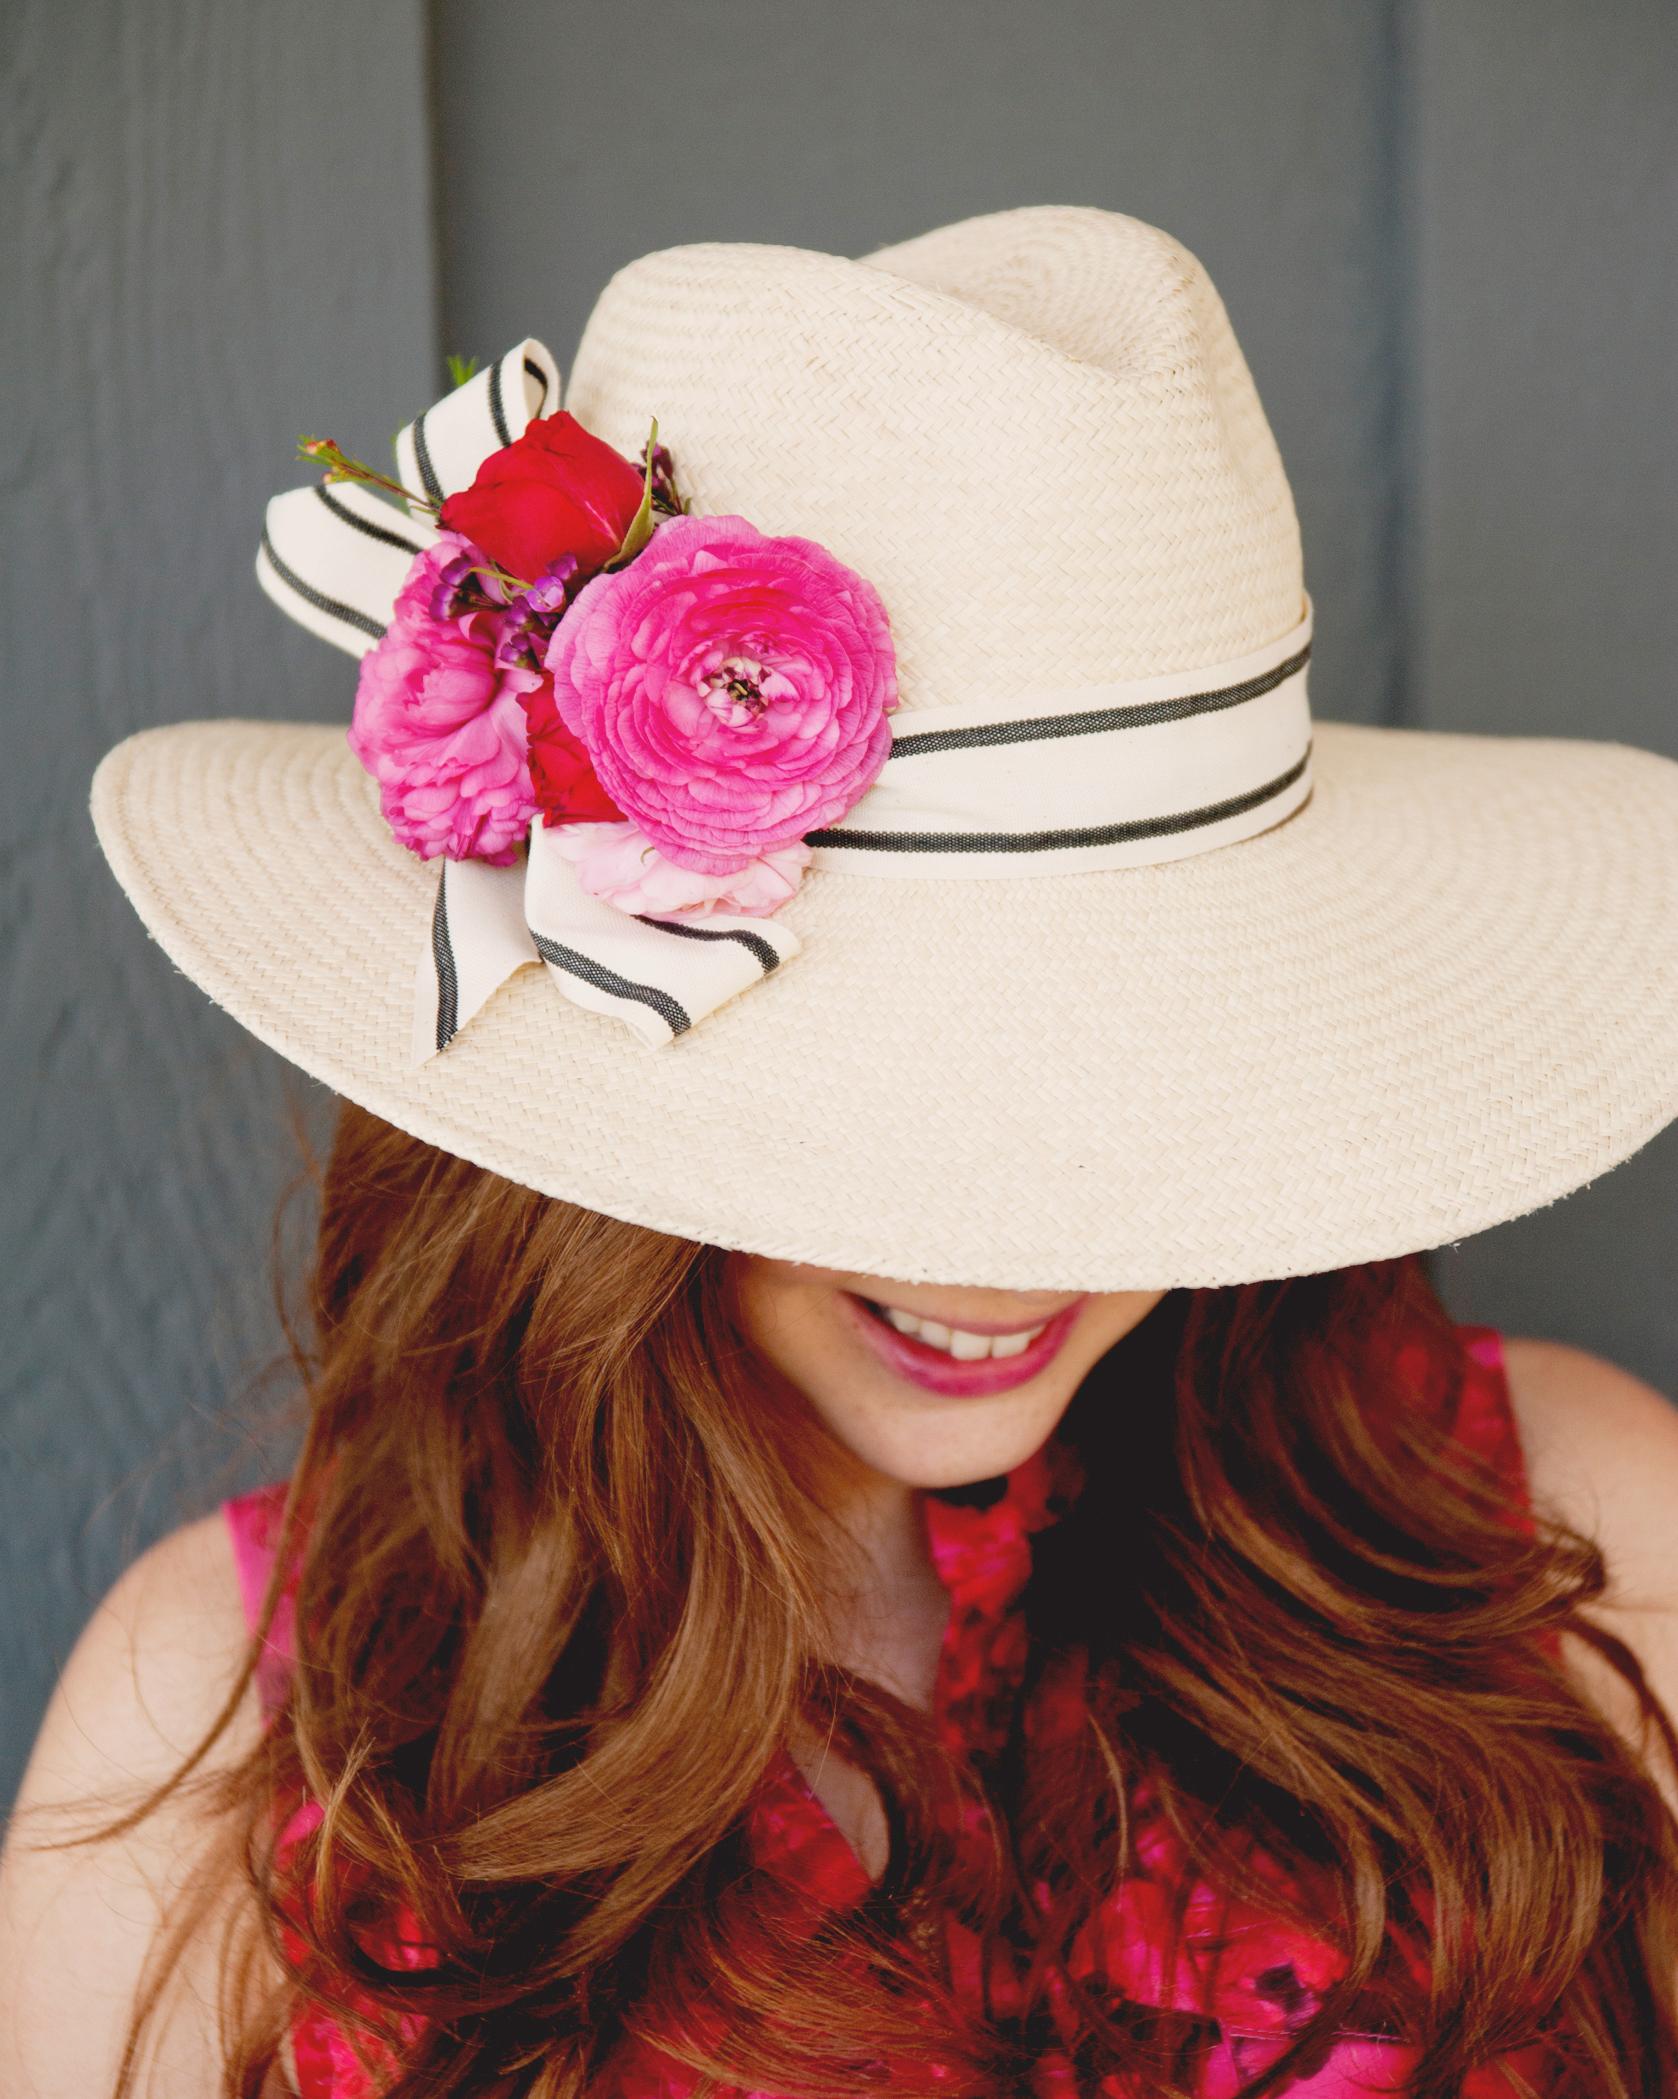 claire-thomas-bridal-shower-derby-diy-wearing-hat-close-0814.jpg